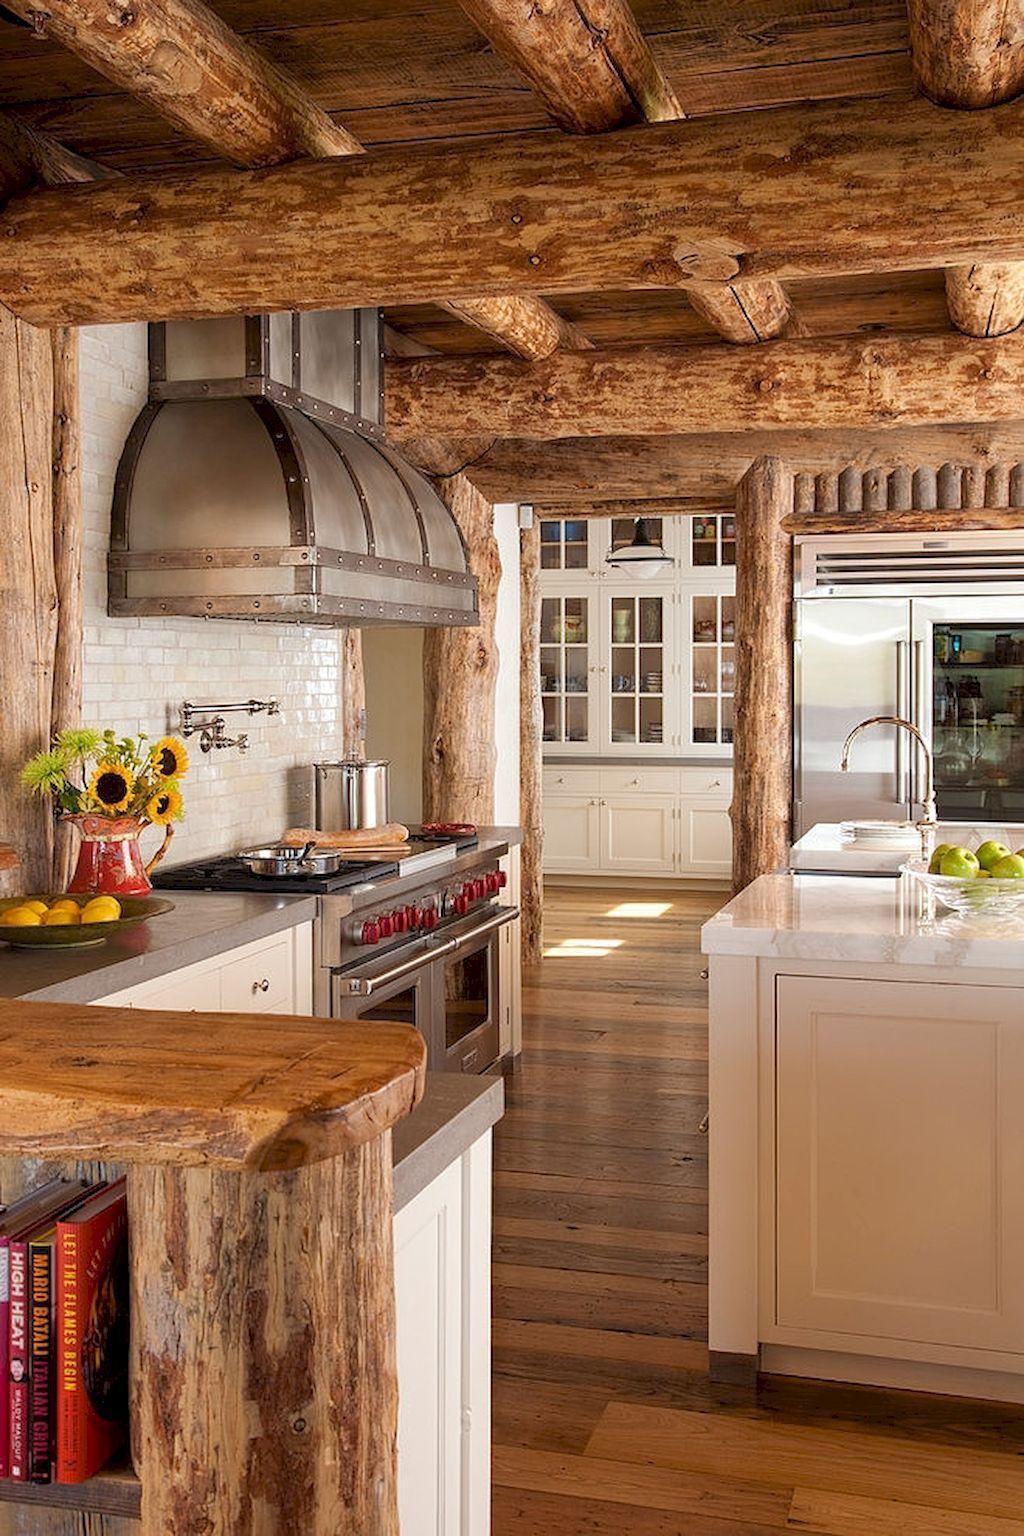 120 modern rustic farmhouse kitchen decor ideas 62 log cabin kitchens rustic house rustic on kitchen id=37677